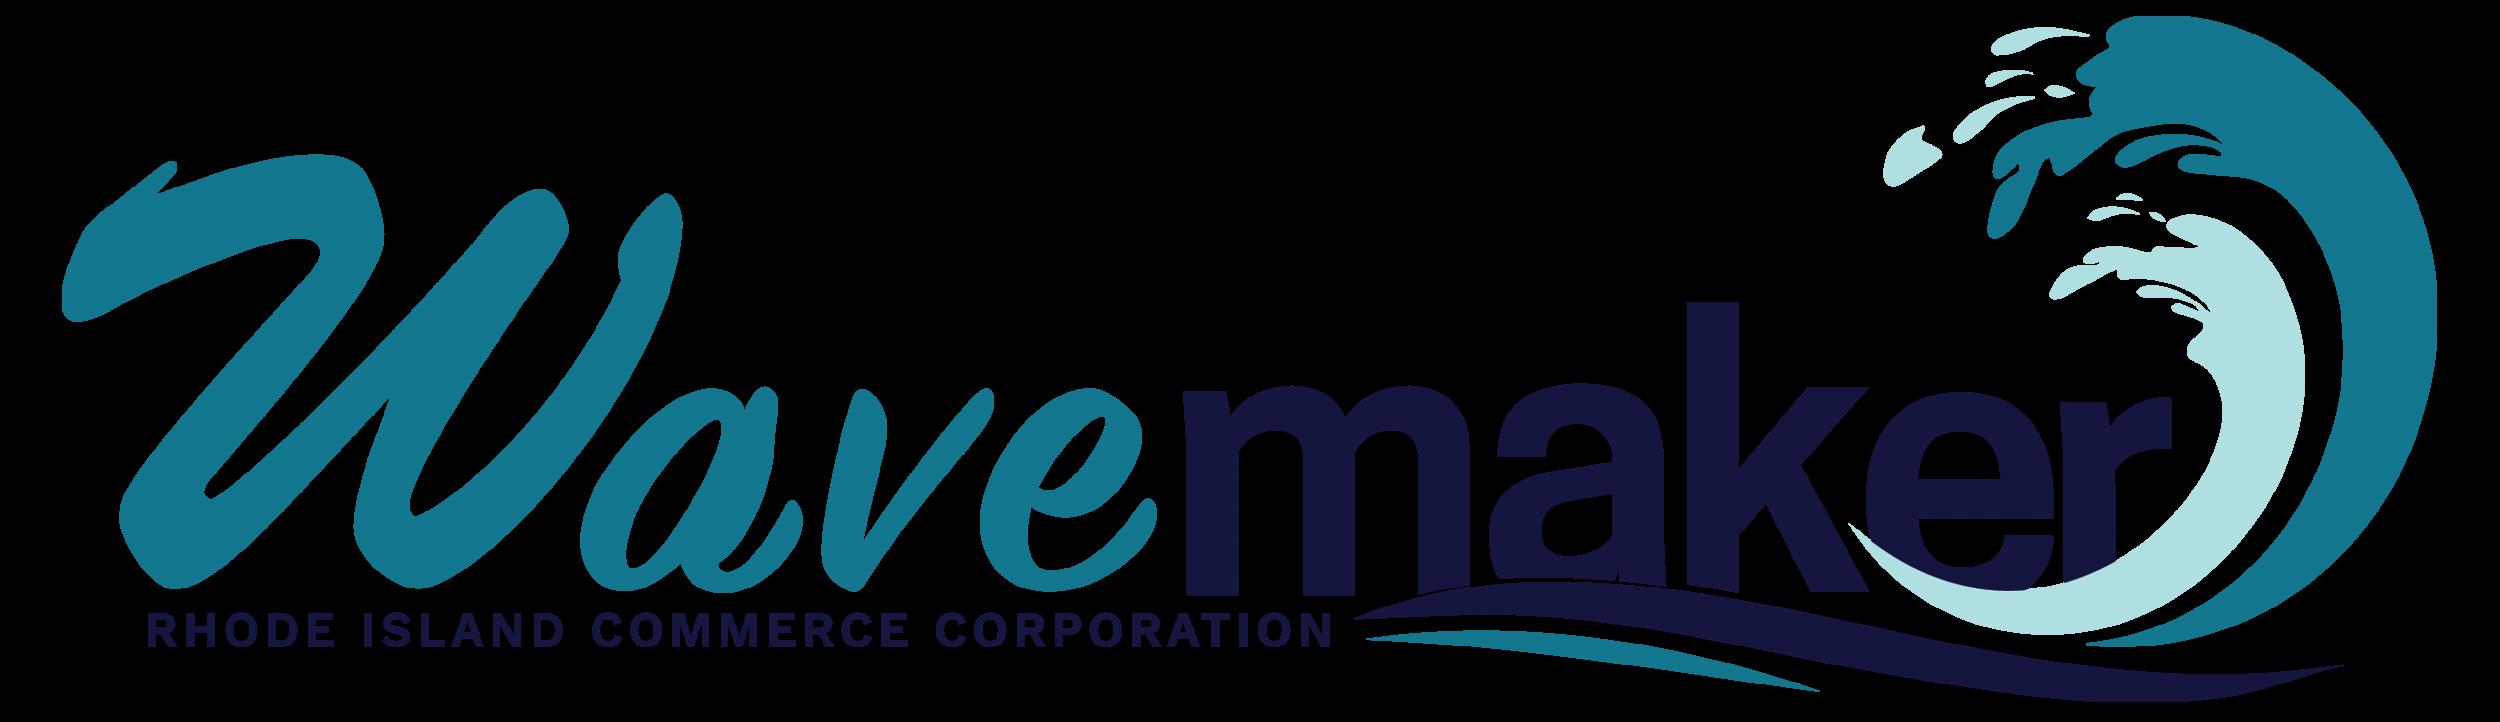 Wavemaker Fellowship Program - February 2021 Update